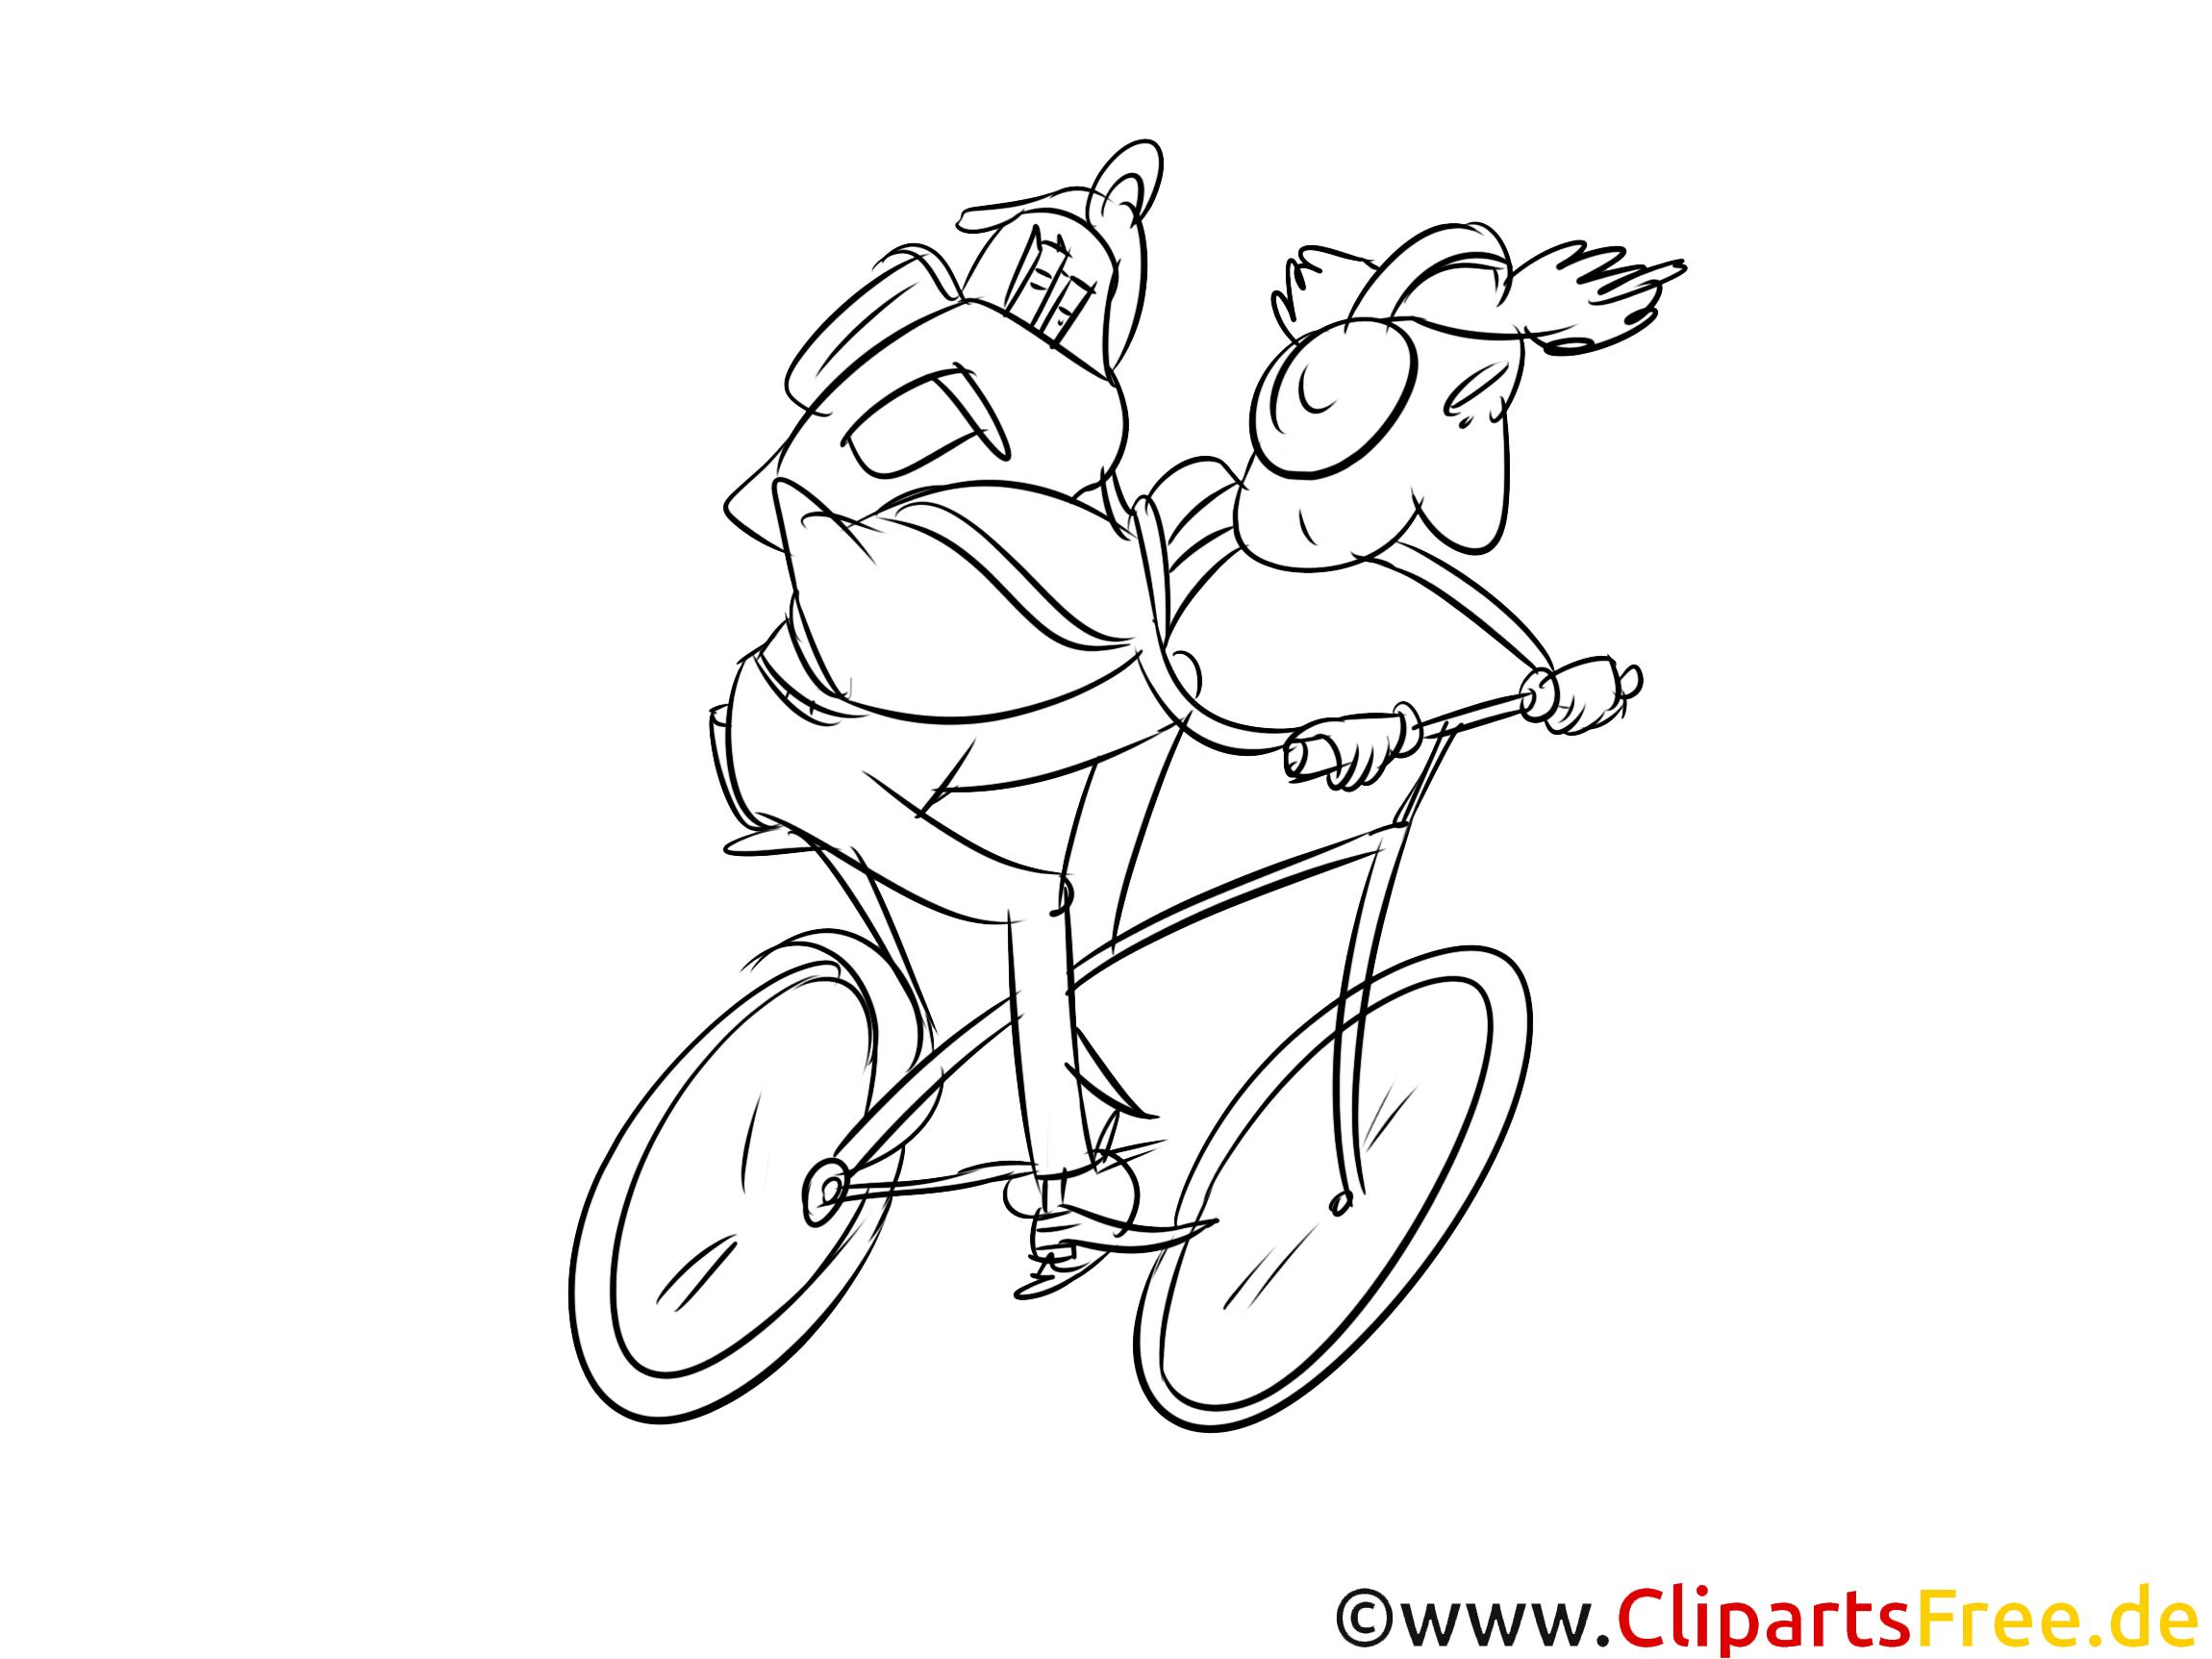 ausmalvorlage fahrrad fahrradfahrer